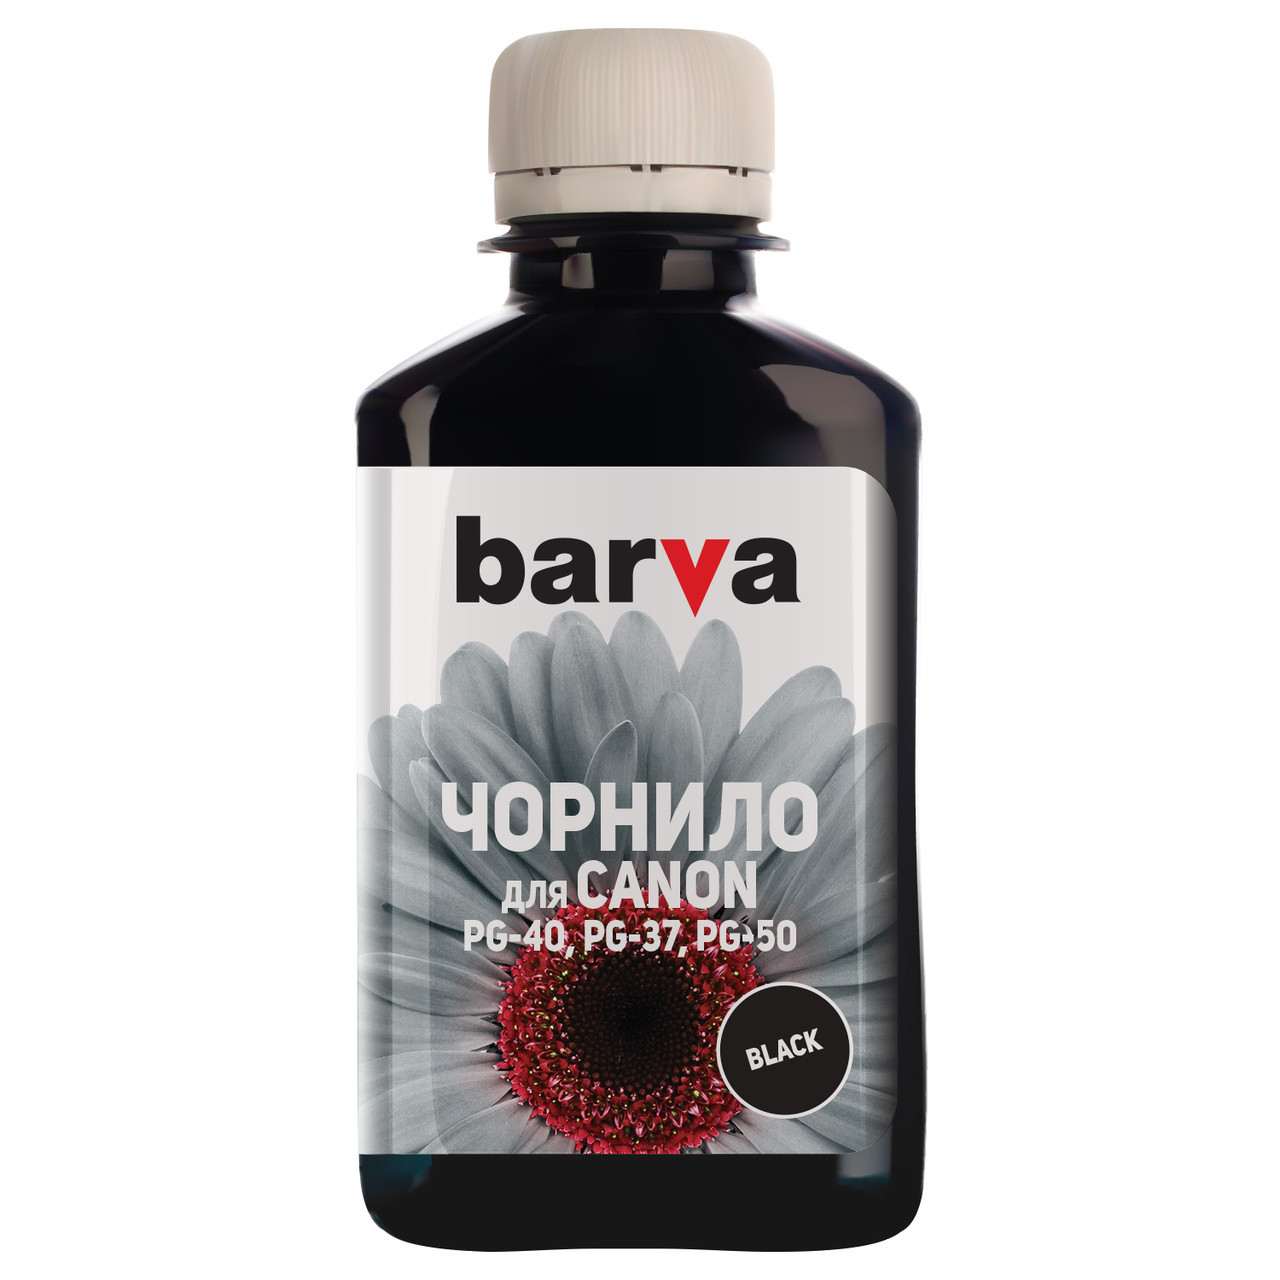 Чернила Barva Canon PG-37 / PG-40 / PG-50, Black, 180 г (C40-080), краска для принтера